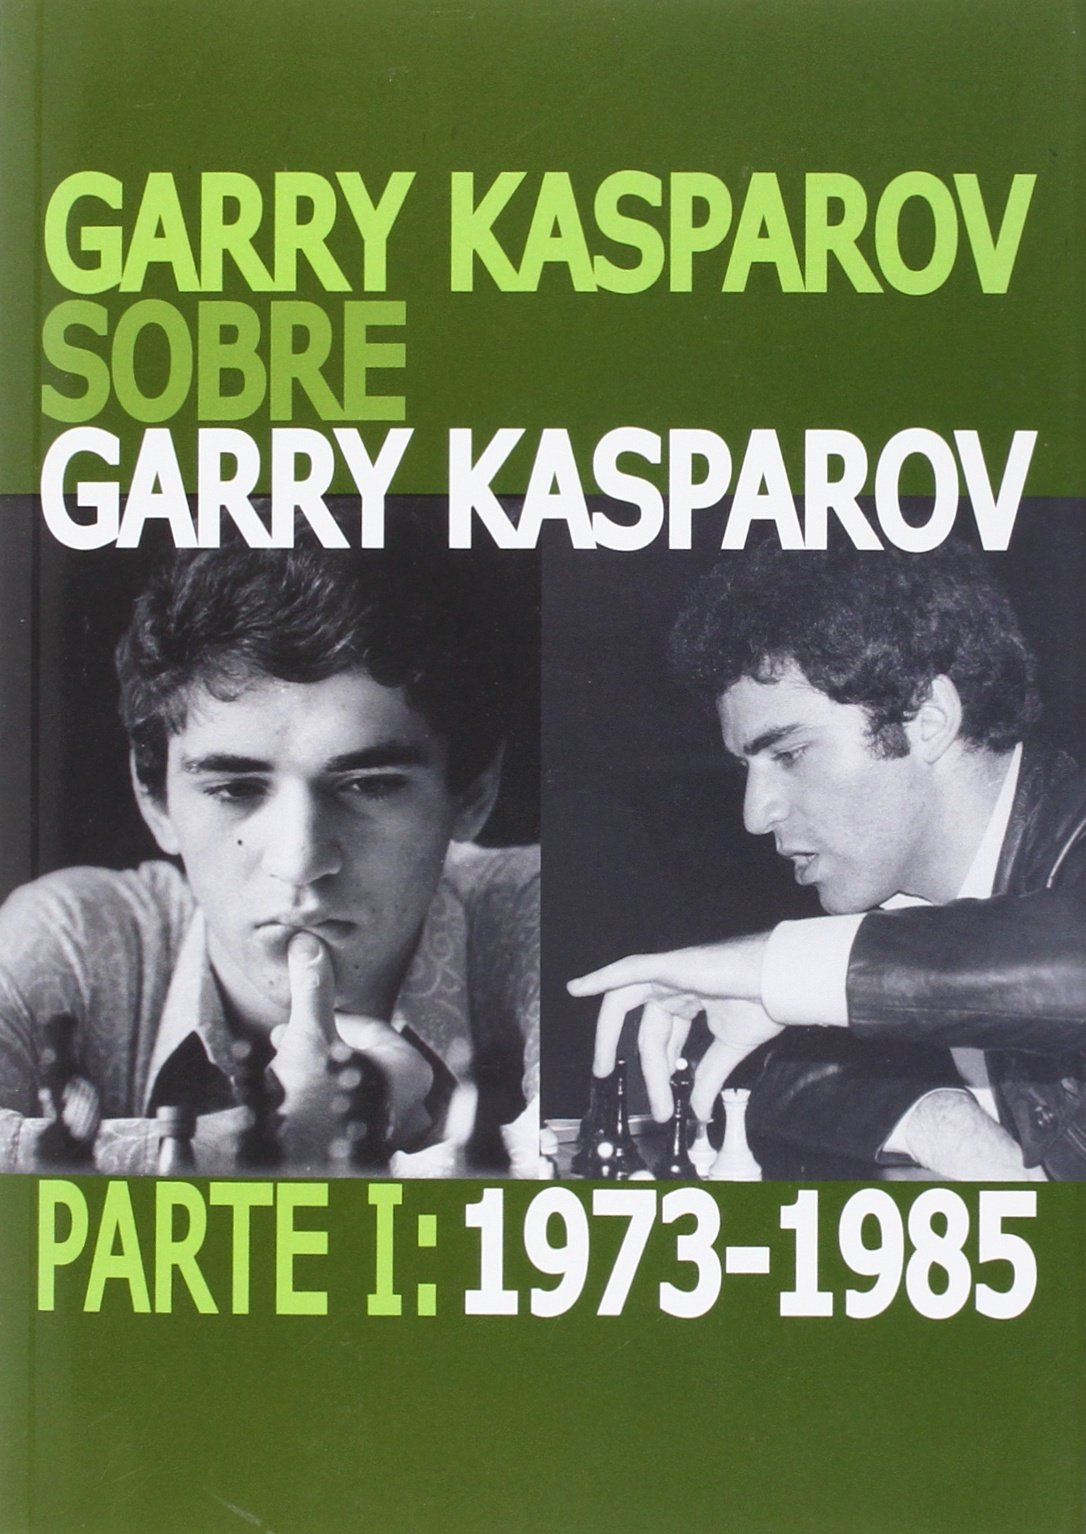 Download GARRY KASPAROV SOBRE GARRY KASPAROV ebook